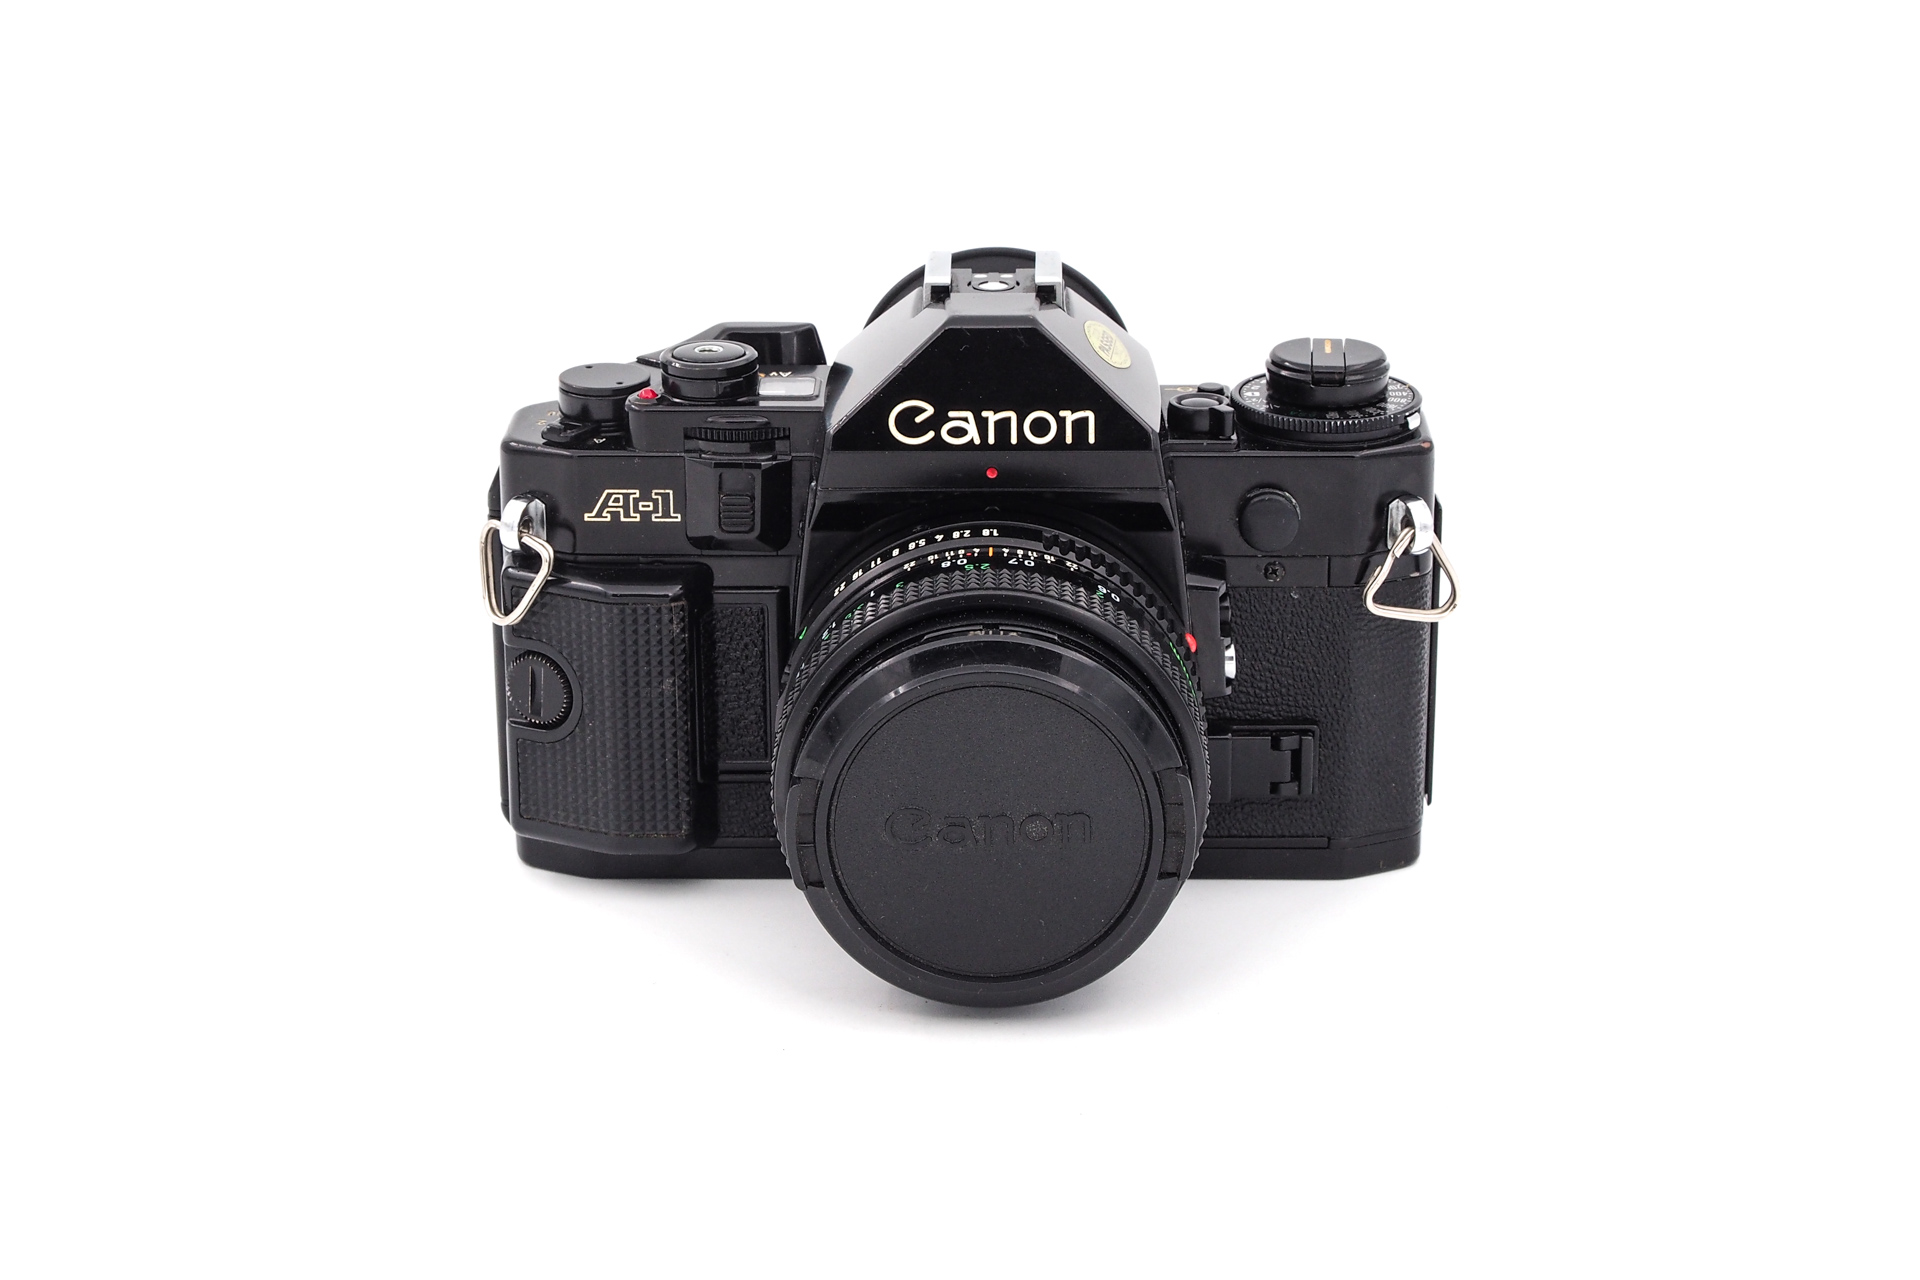 Canon A-1 + 50mm F/1.8